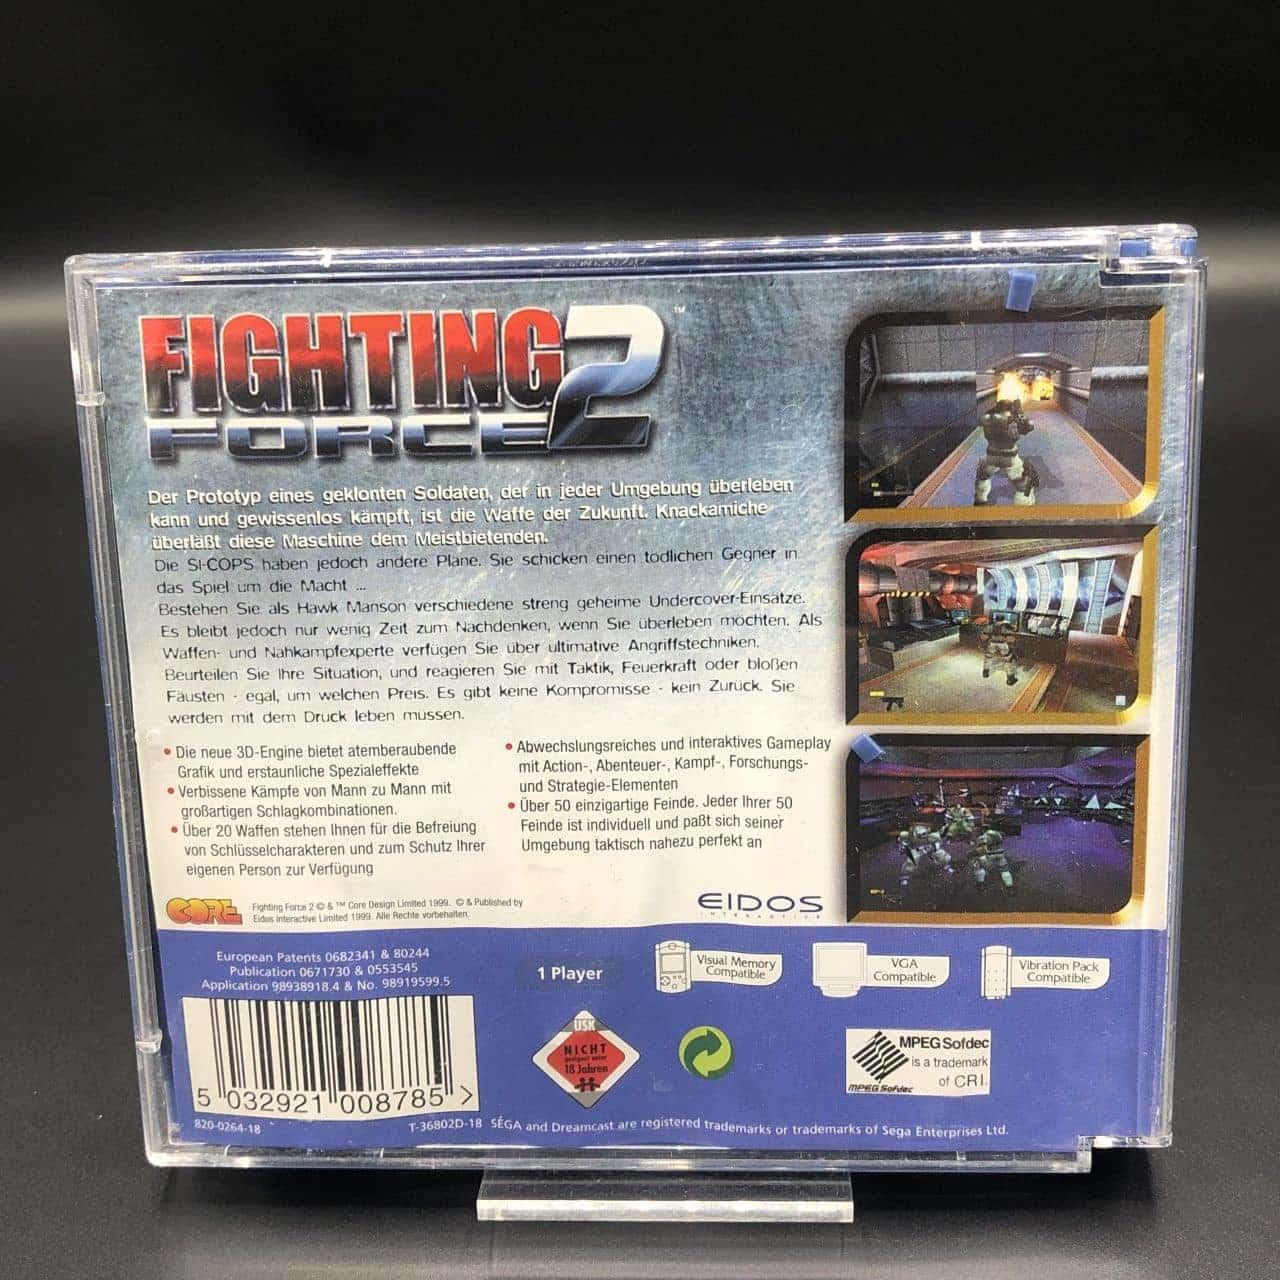 Fighting Force 2 (Komplett) (Gebrauchsspuren) Sega Dreamcast (FSK18)